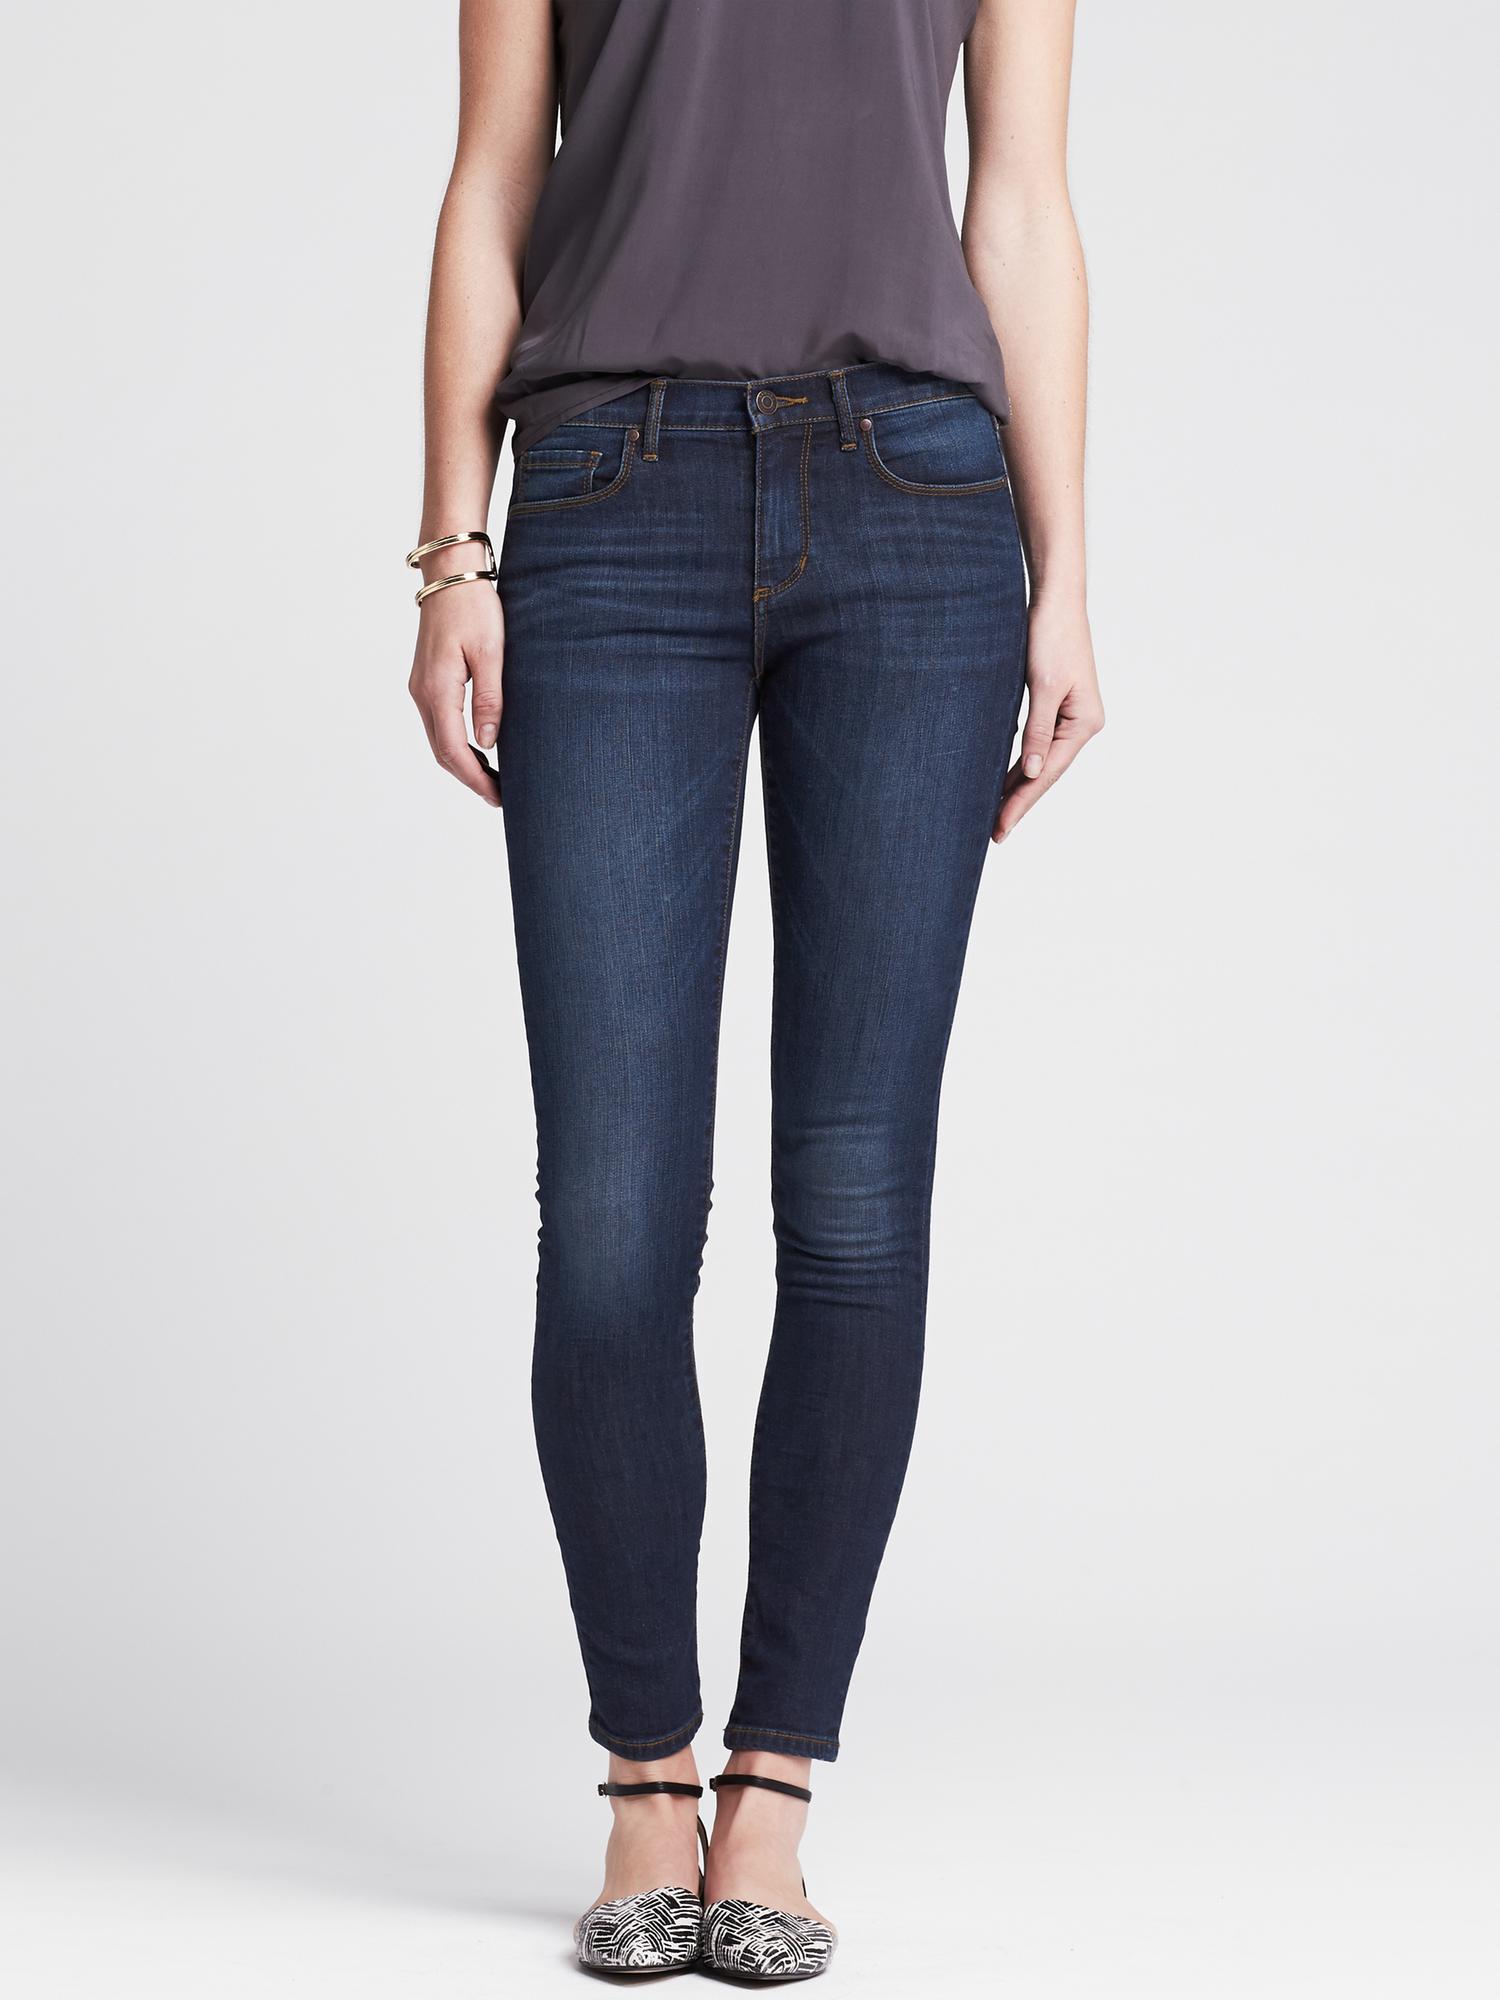 Banana republic Medium Wash Skinny Jean in Blue Medium